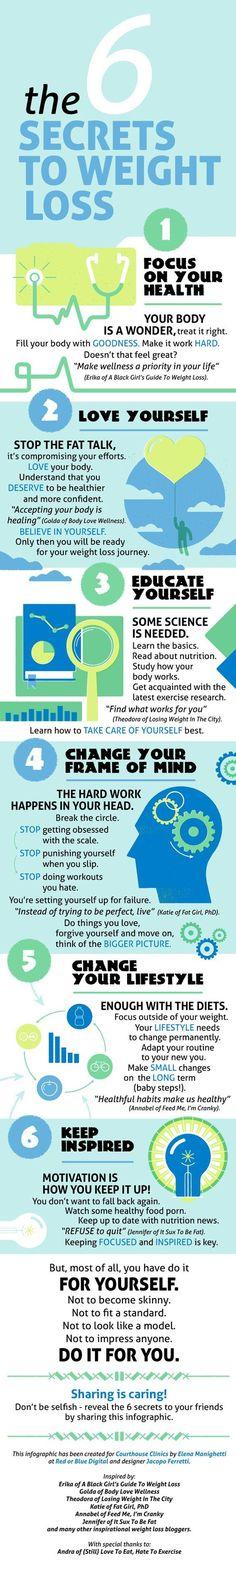 6 Secrets to Weight Loss - #HealthyHappySmart #WeightLoss